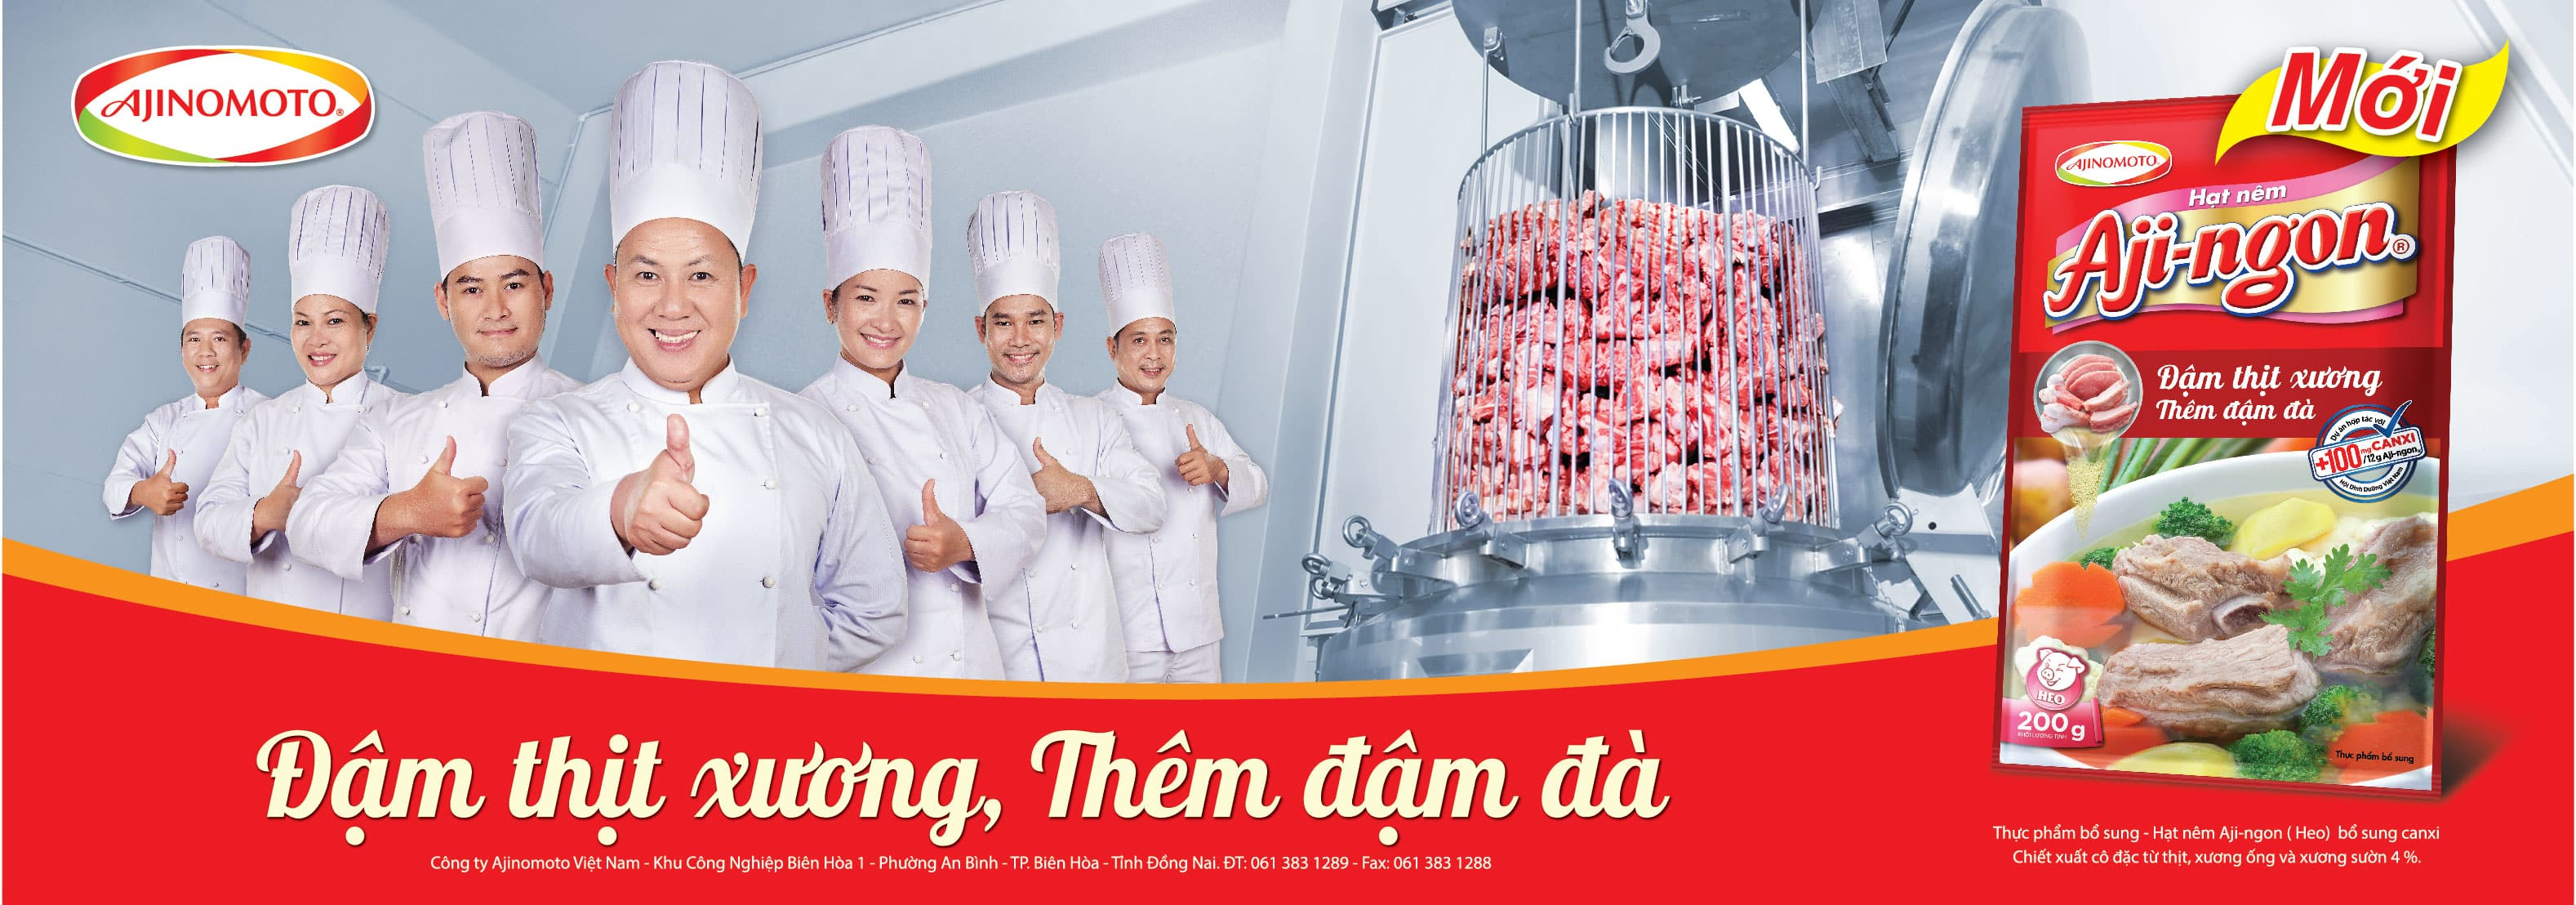 Image result for Hạt nêm AJI-NGON vị heo